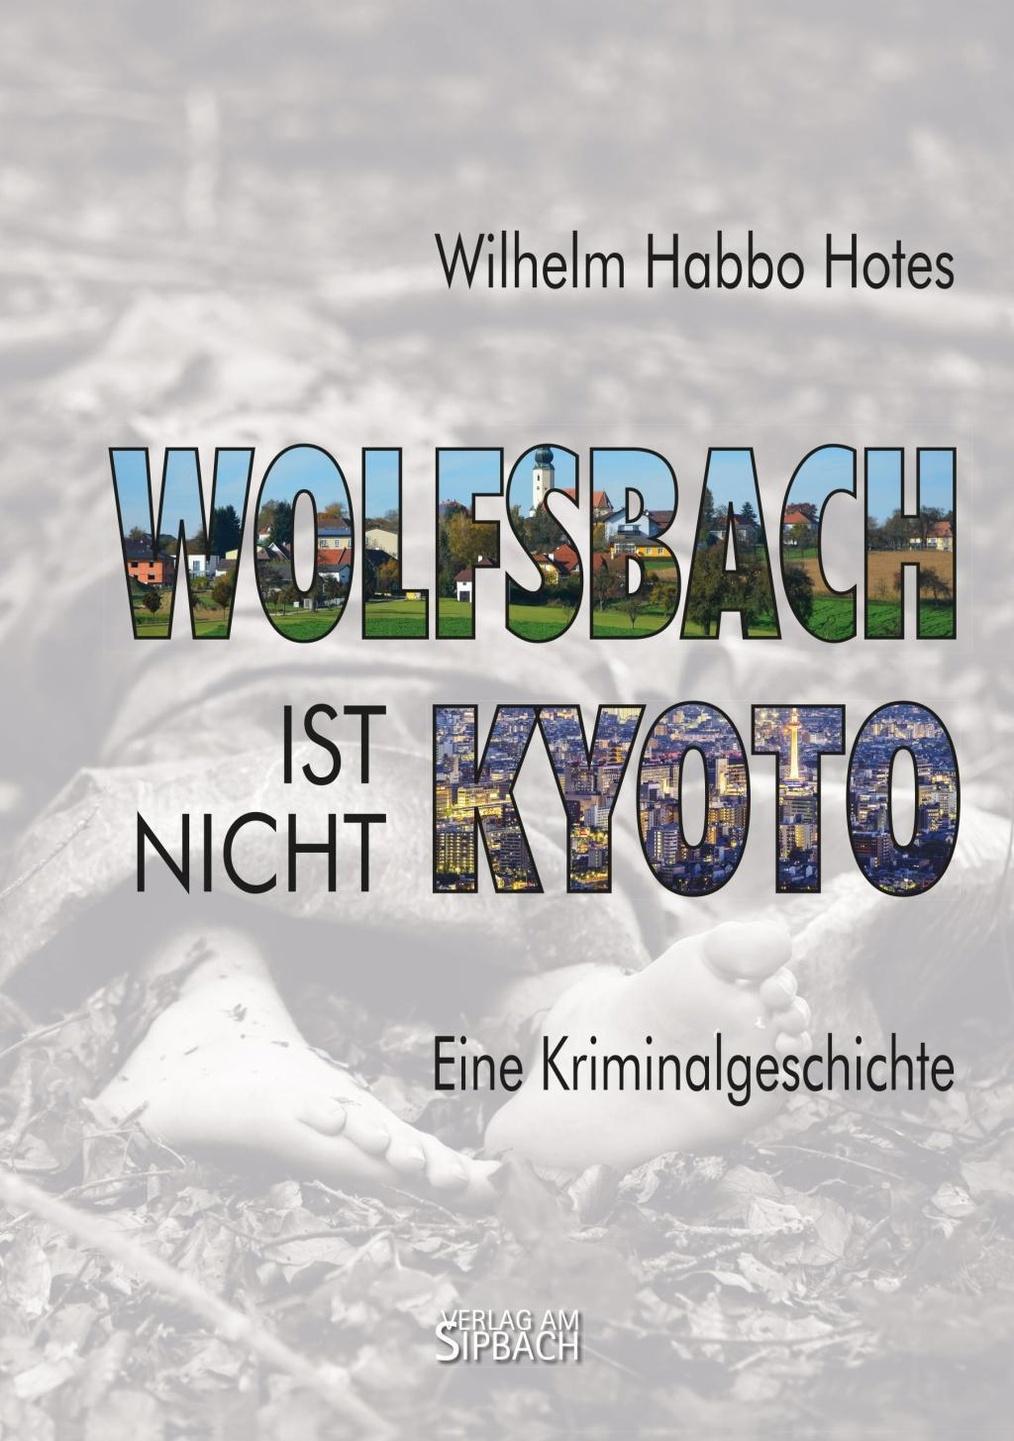 Erotik Wolfsbach | Locanto Erotik Dating Wolfsbach